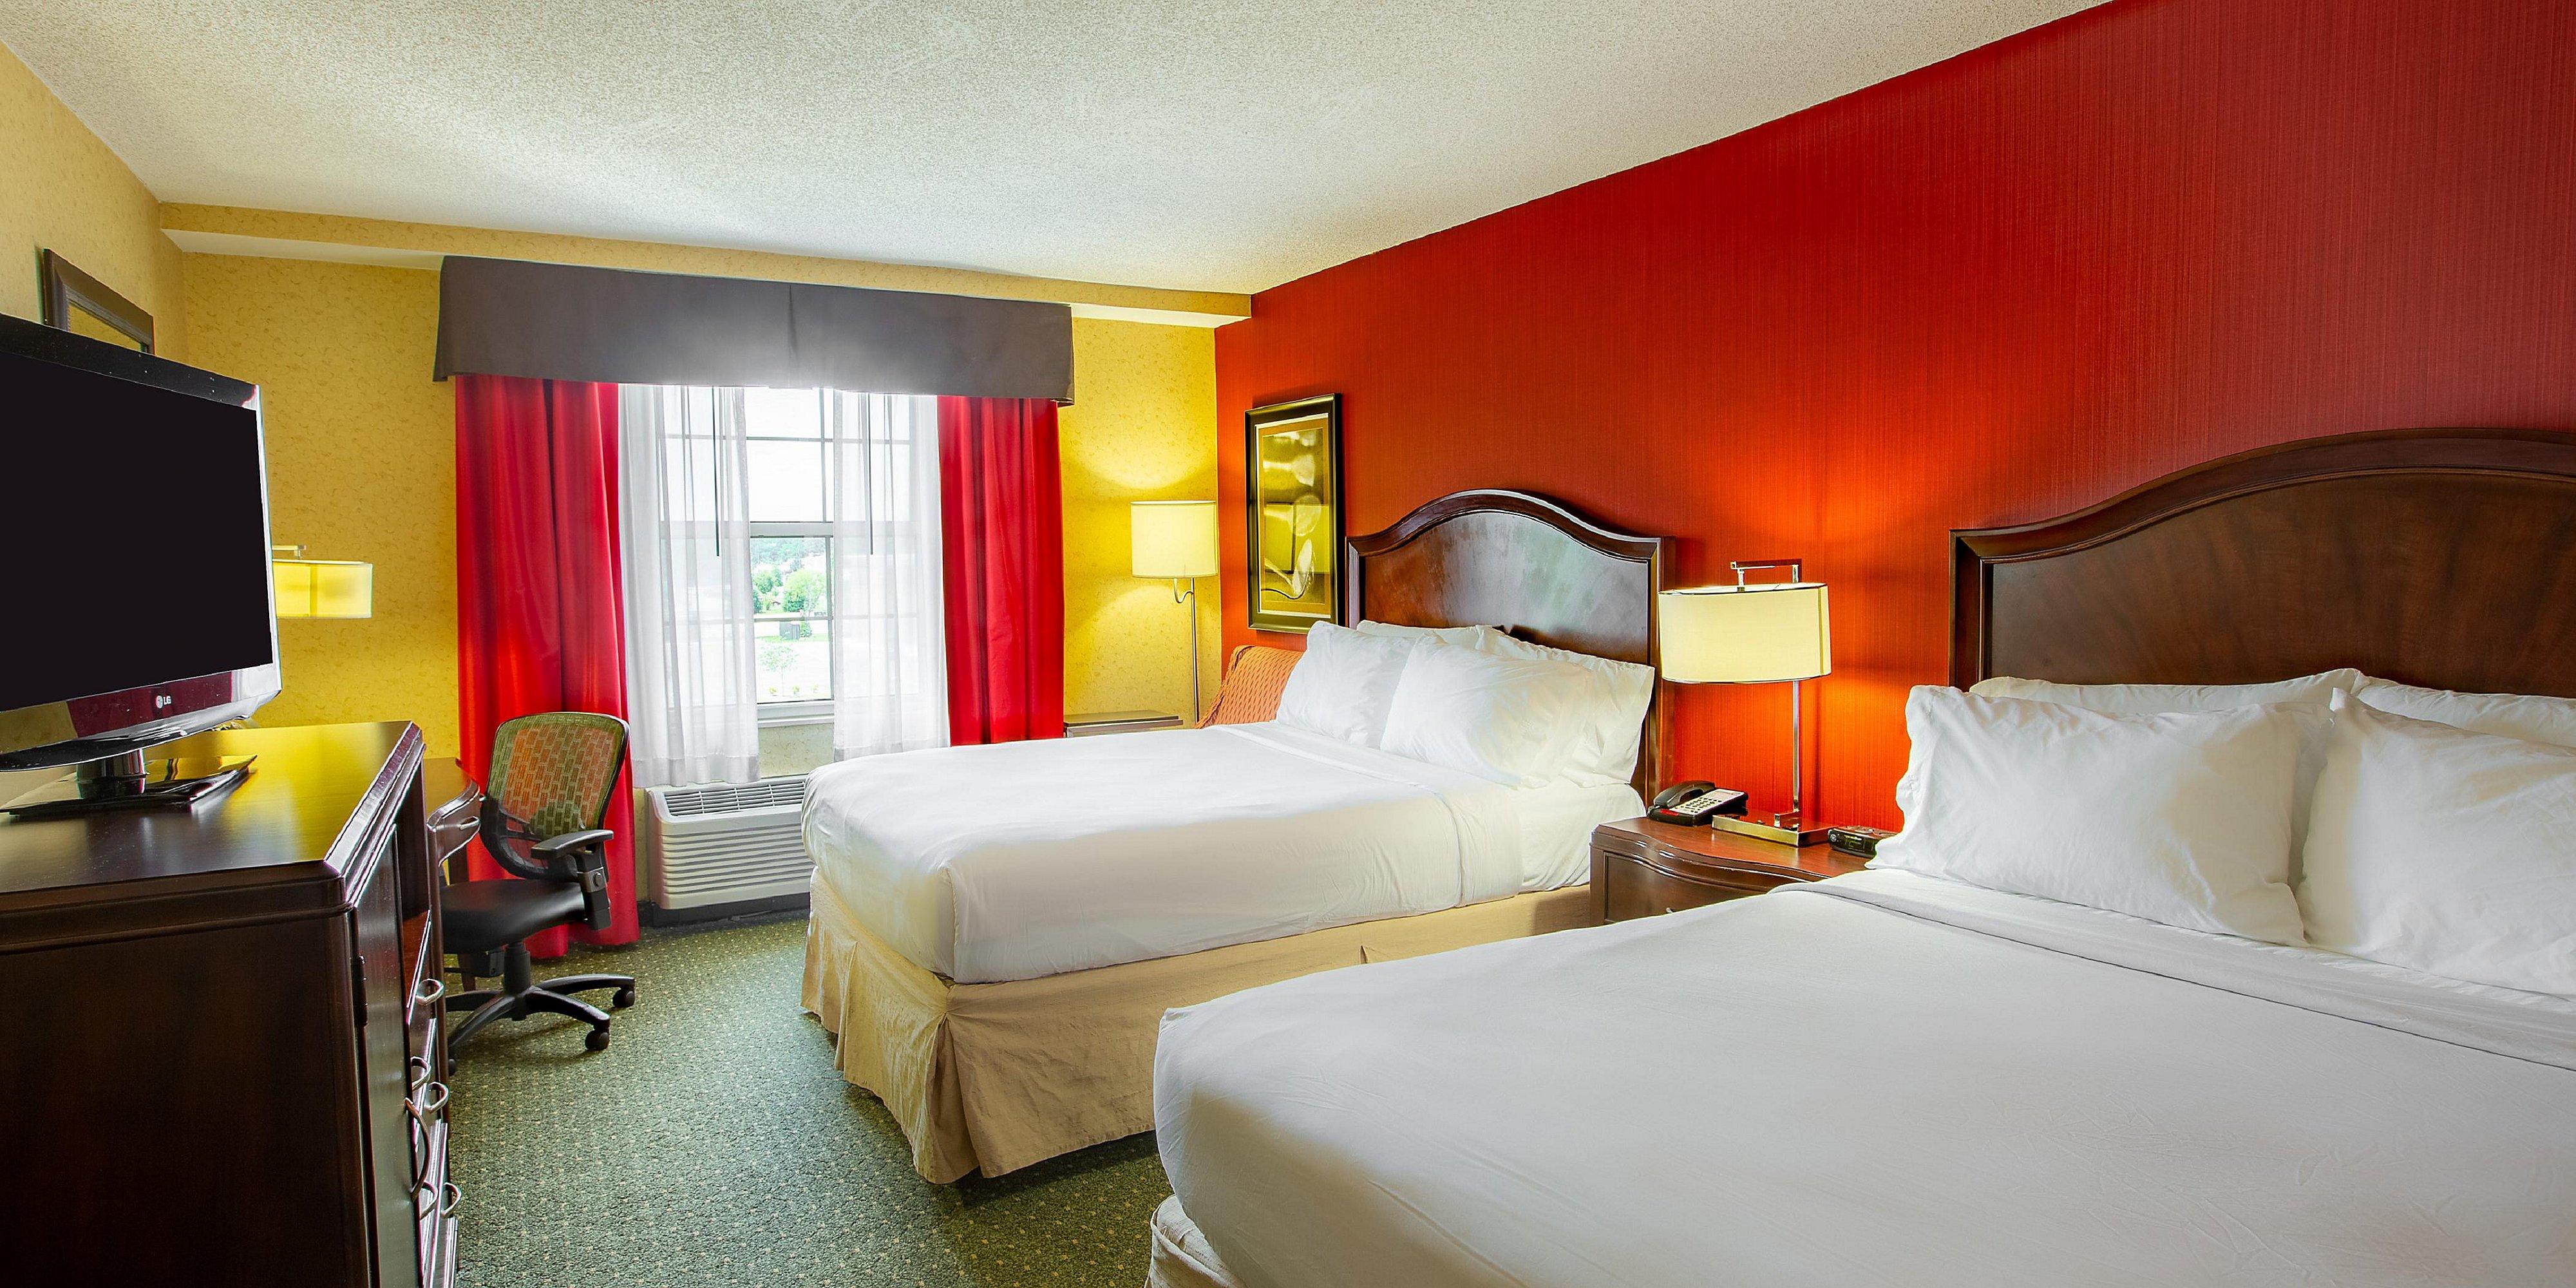 Holiday Inn Express Suites Williamsburg Ihg Hotel